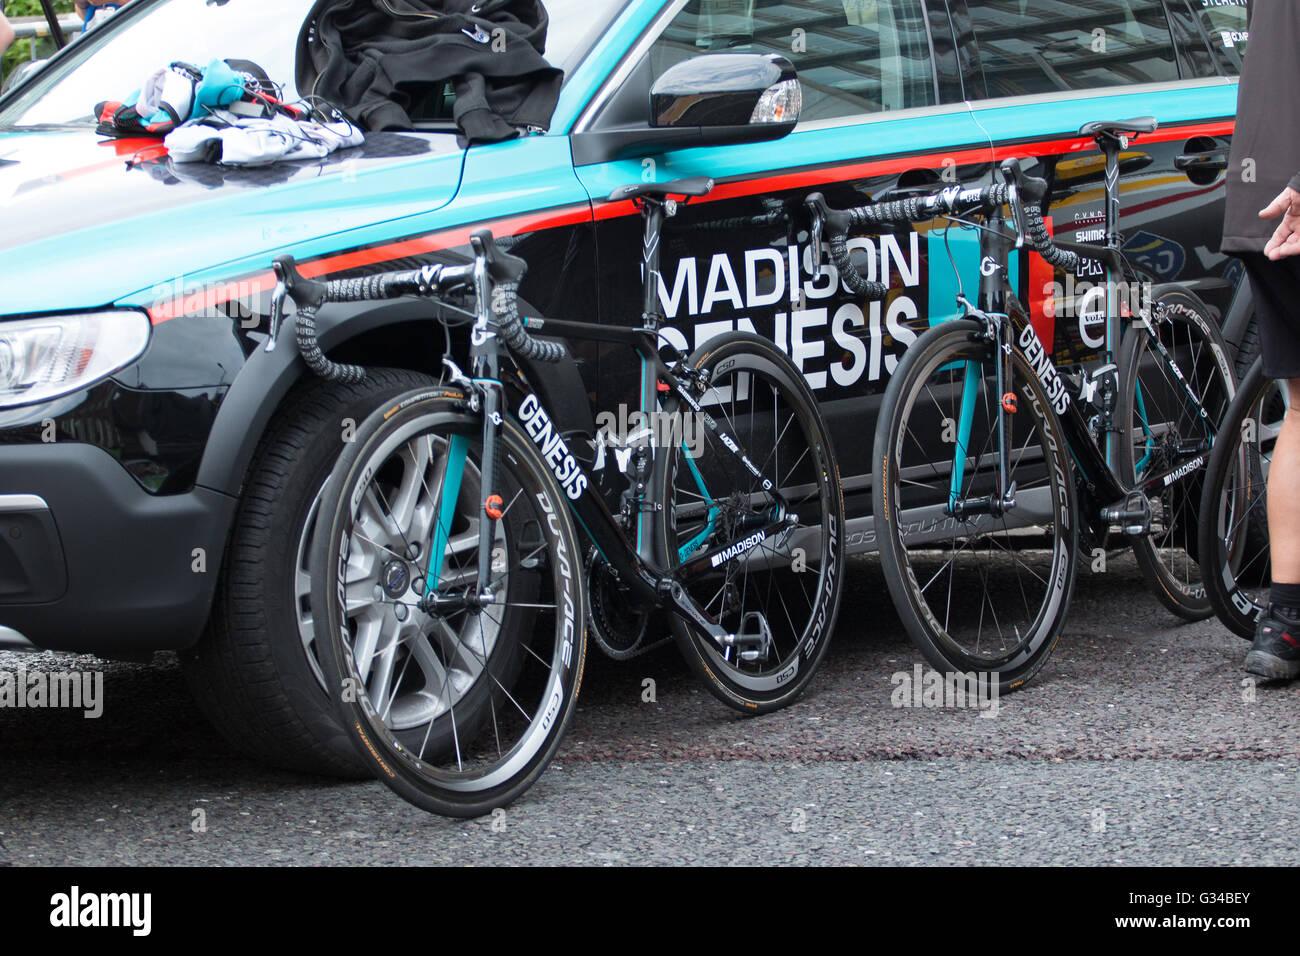 Madison Genesis Cycling Team Auto und Fahrräder Stockbild